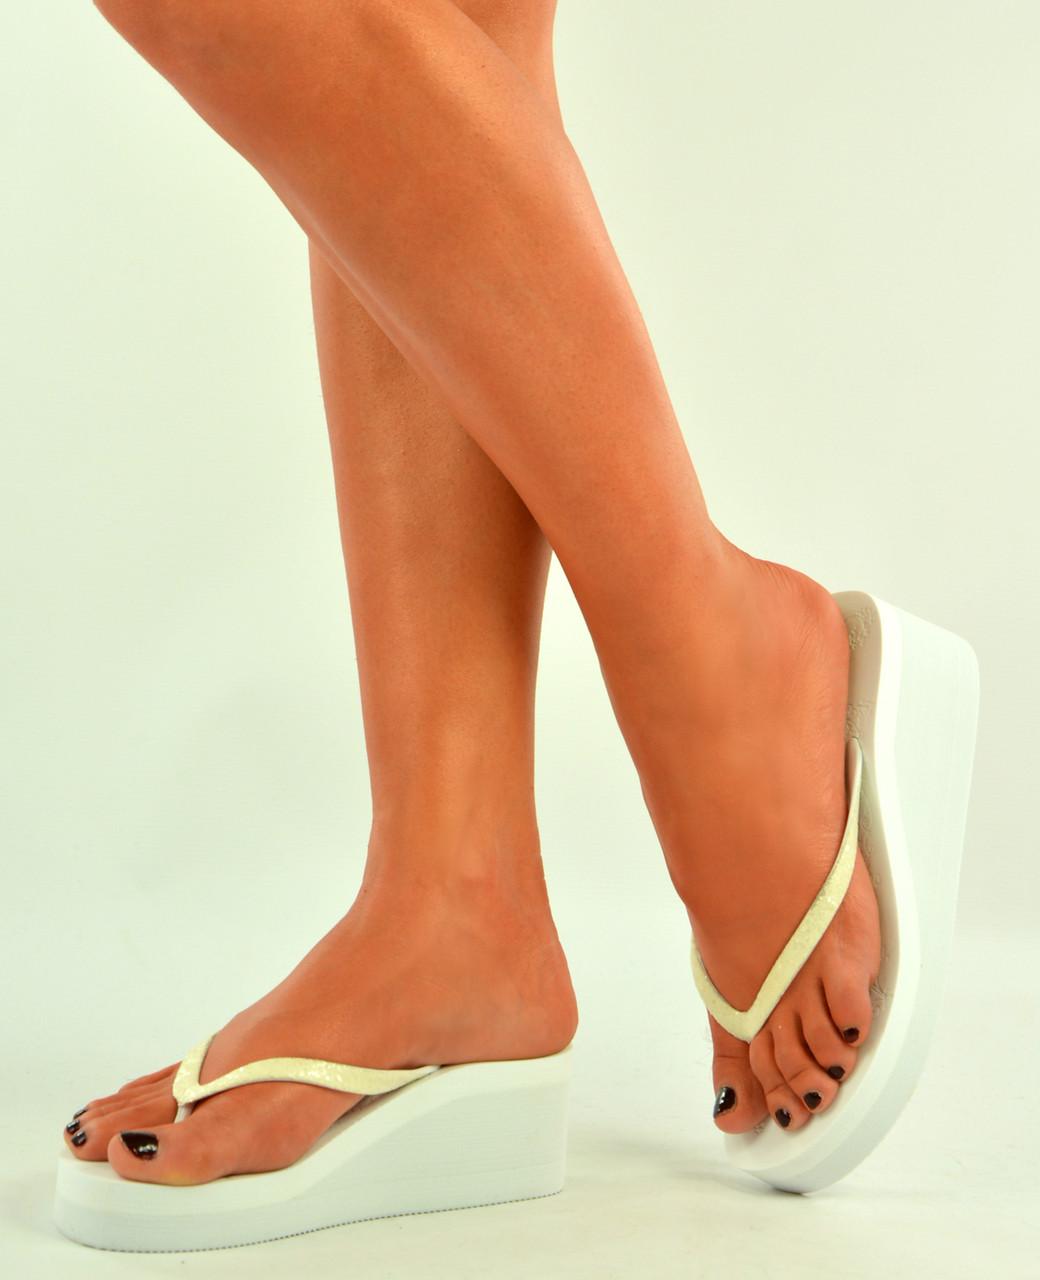 6f04a2fffe4e88 New womens ladies white flip flops wedges platform summer sandals jpg  1040x1280 Platform flip flop sandals